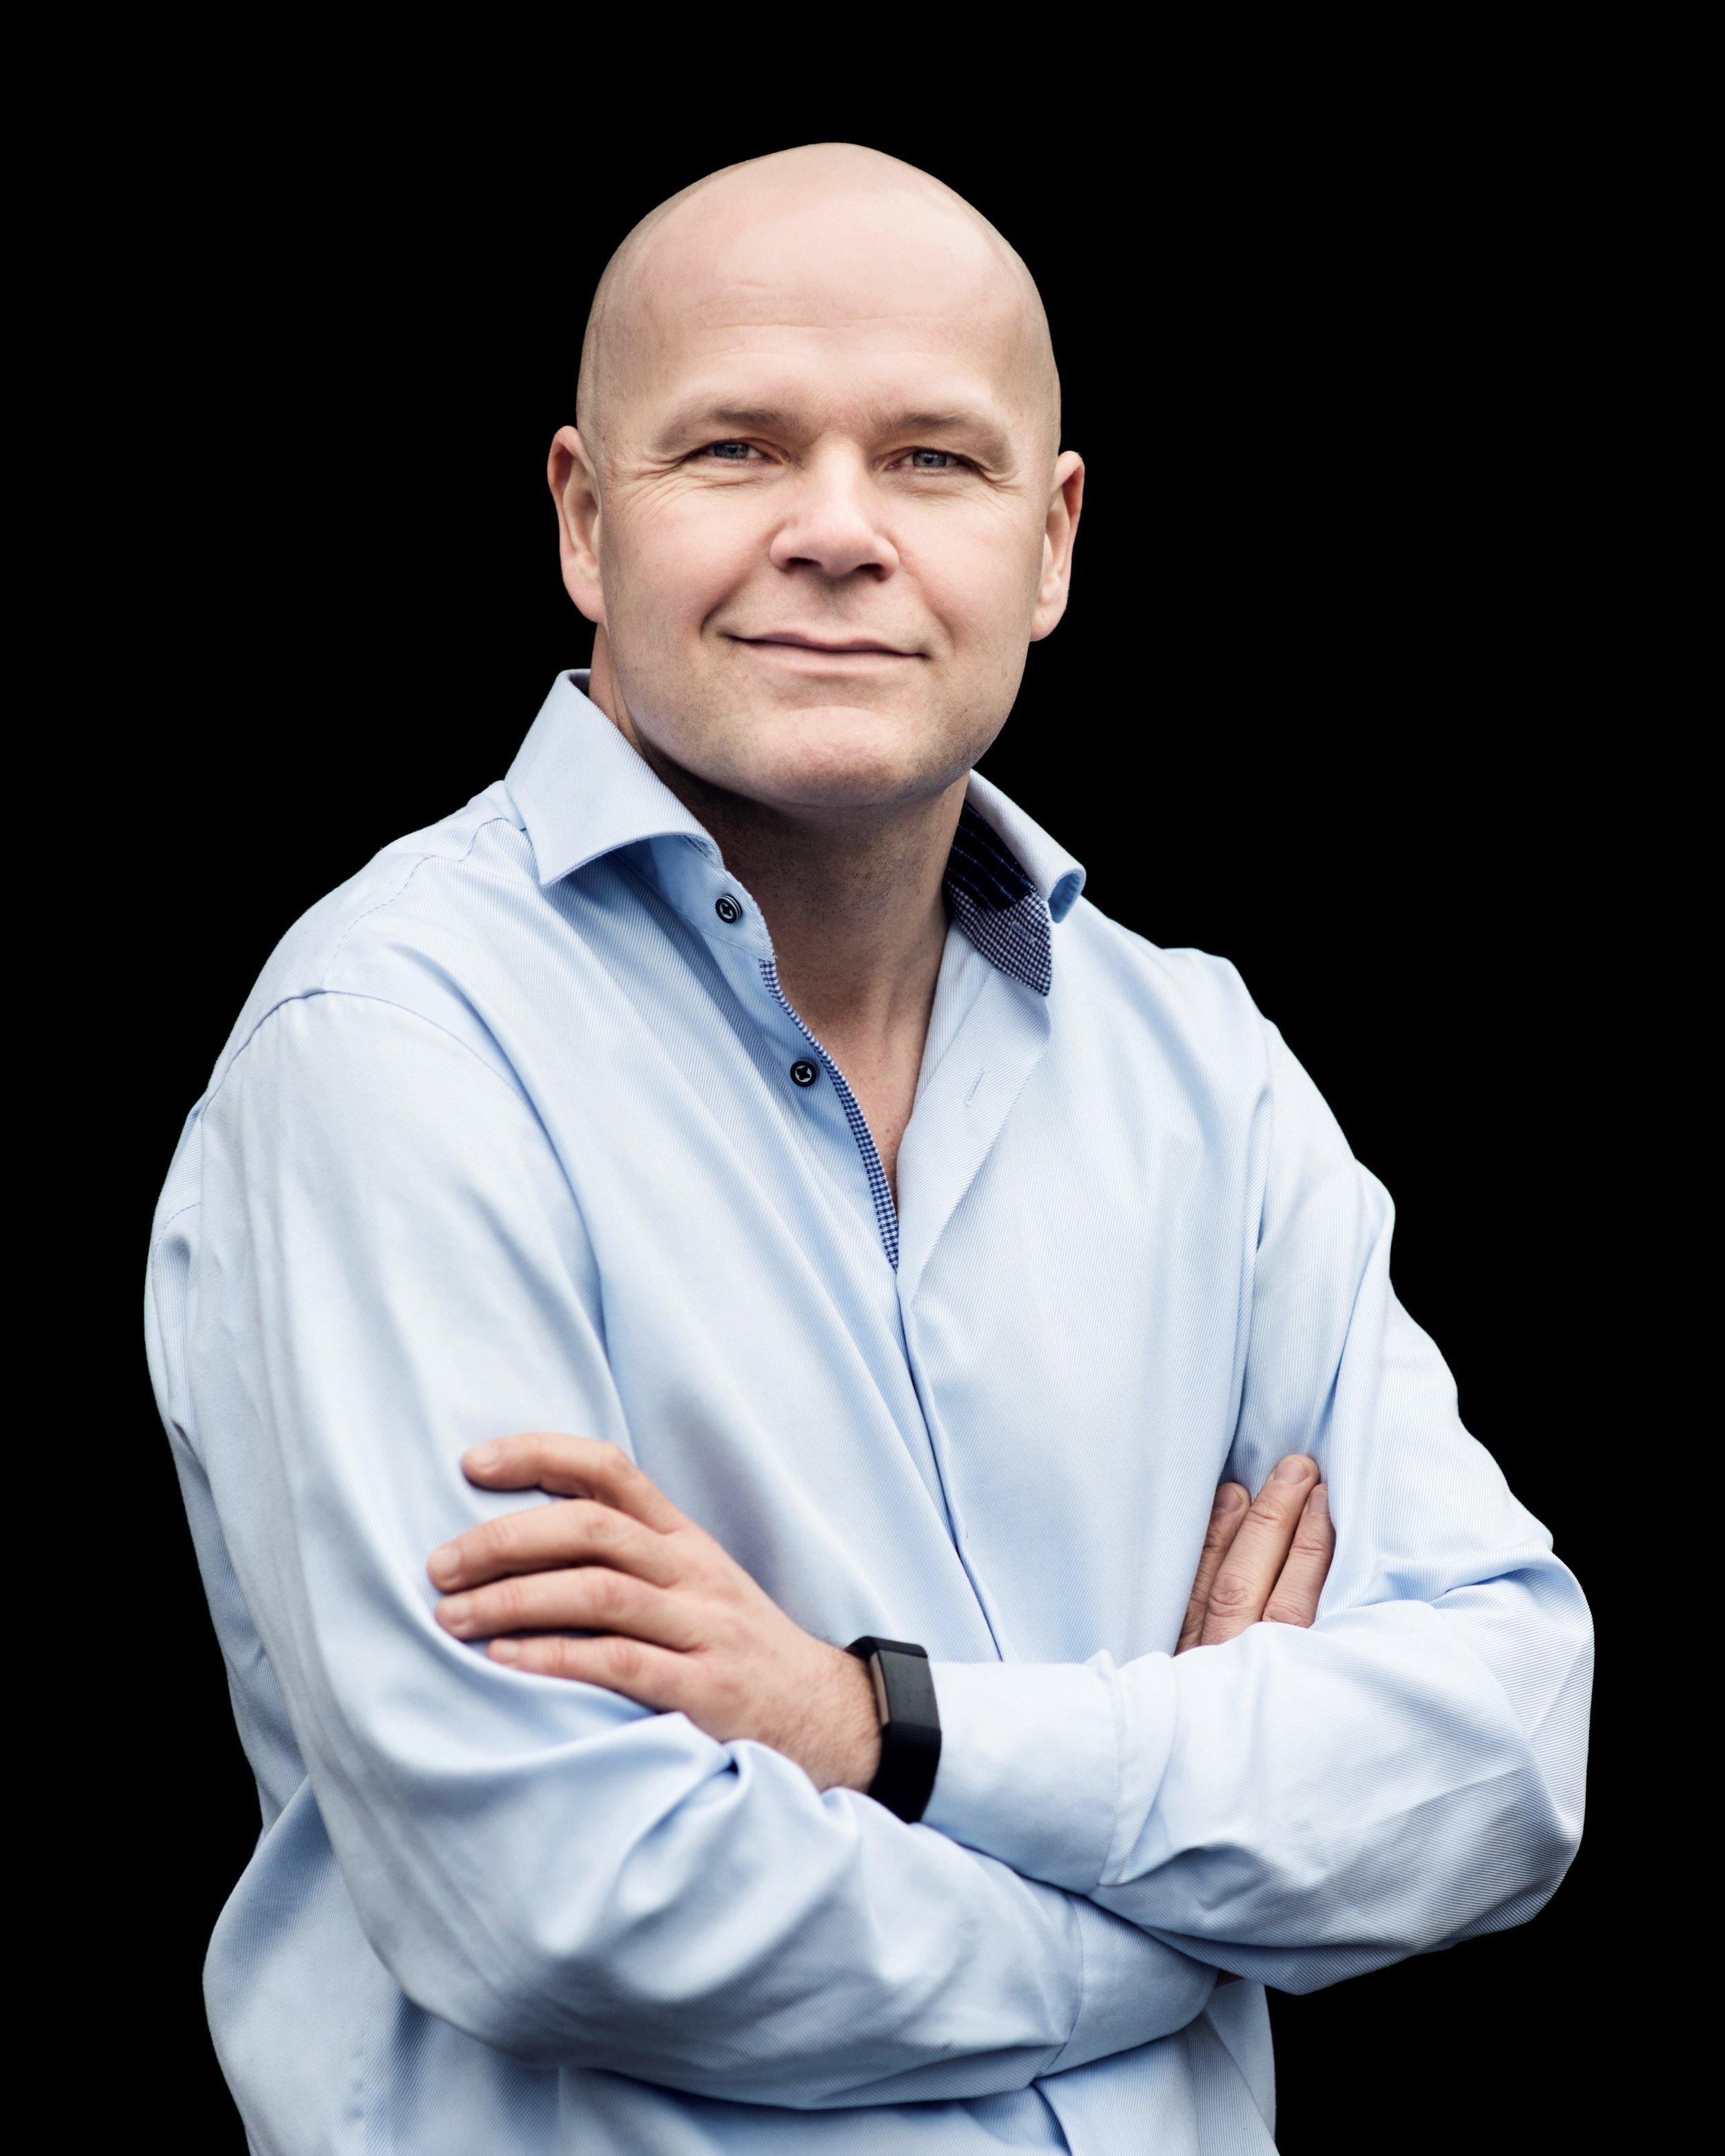 Nicolaj Højer Nielsen - Author, entrepreneur, investor and professor at Copenhagen Business School